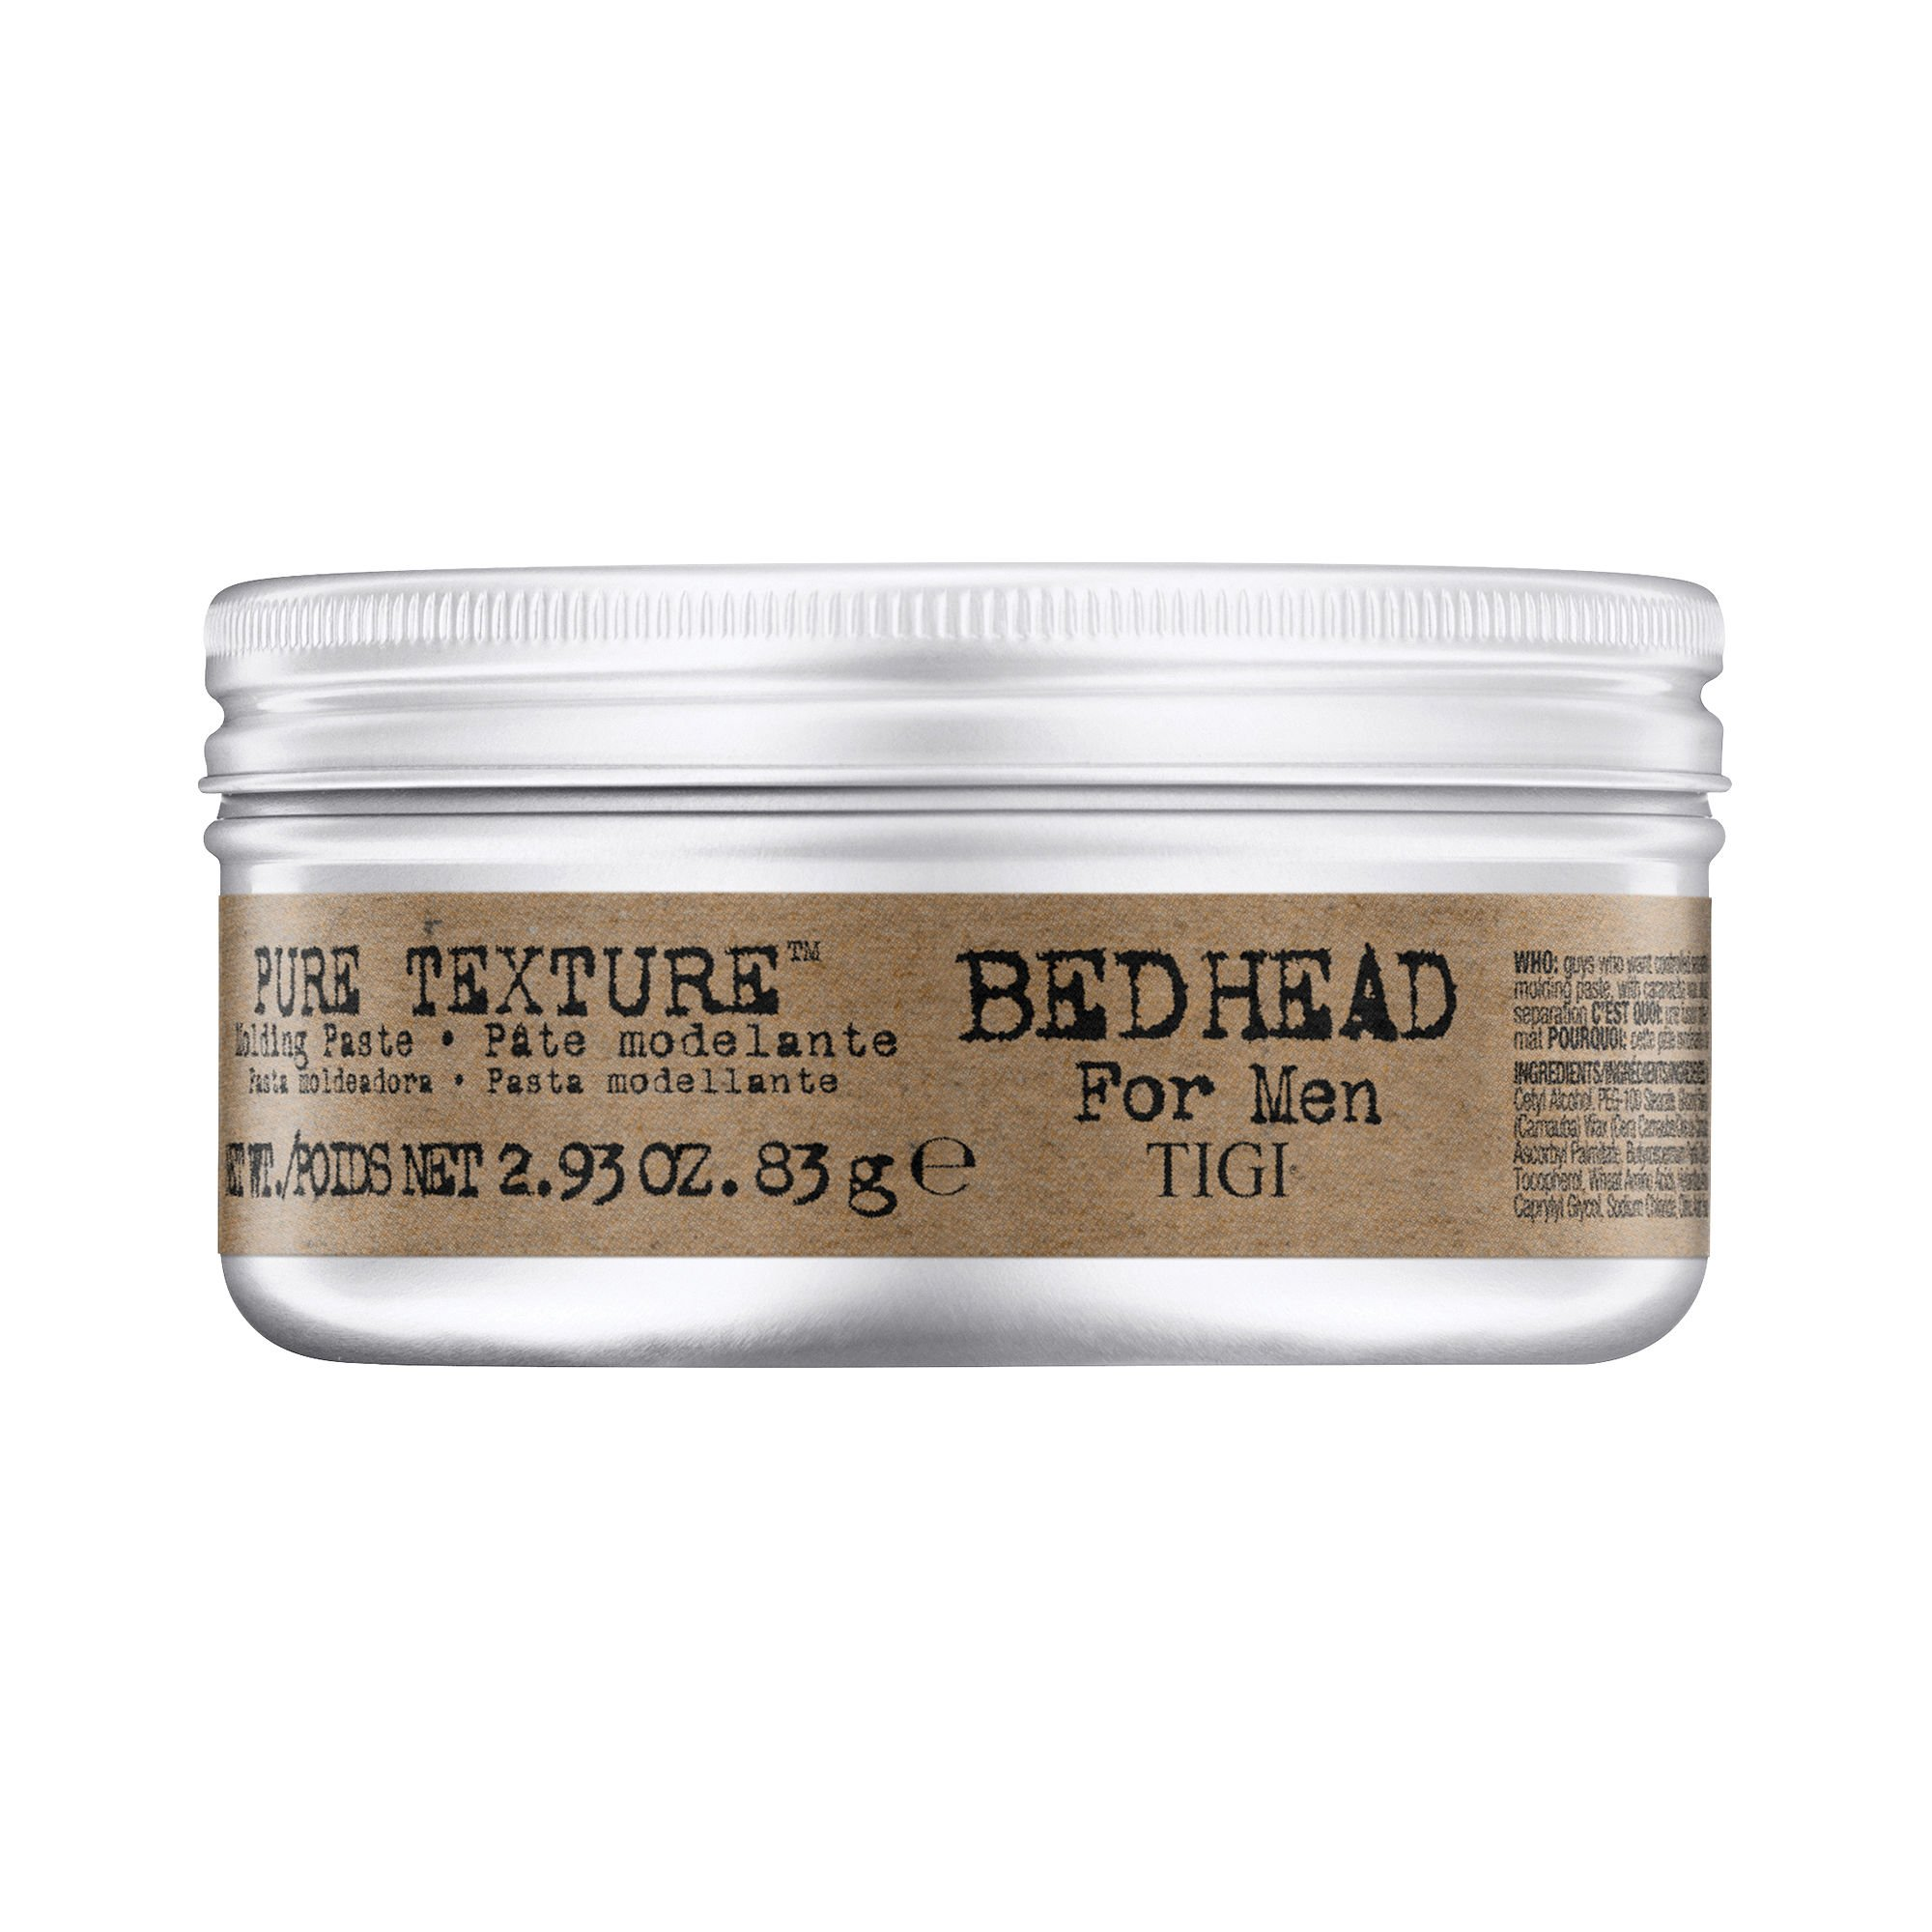 TIGI - Bed Head For Men Pure Texture Molding Paste